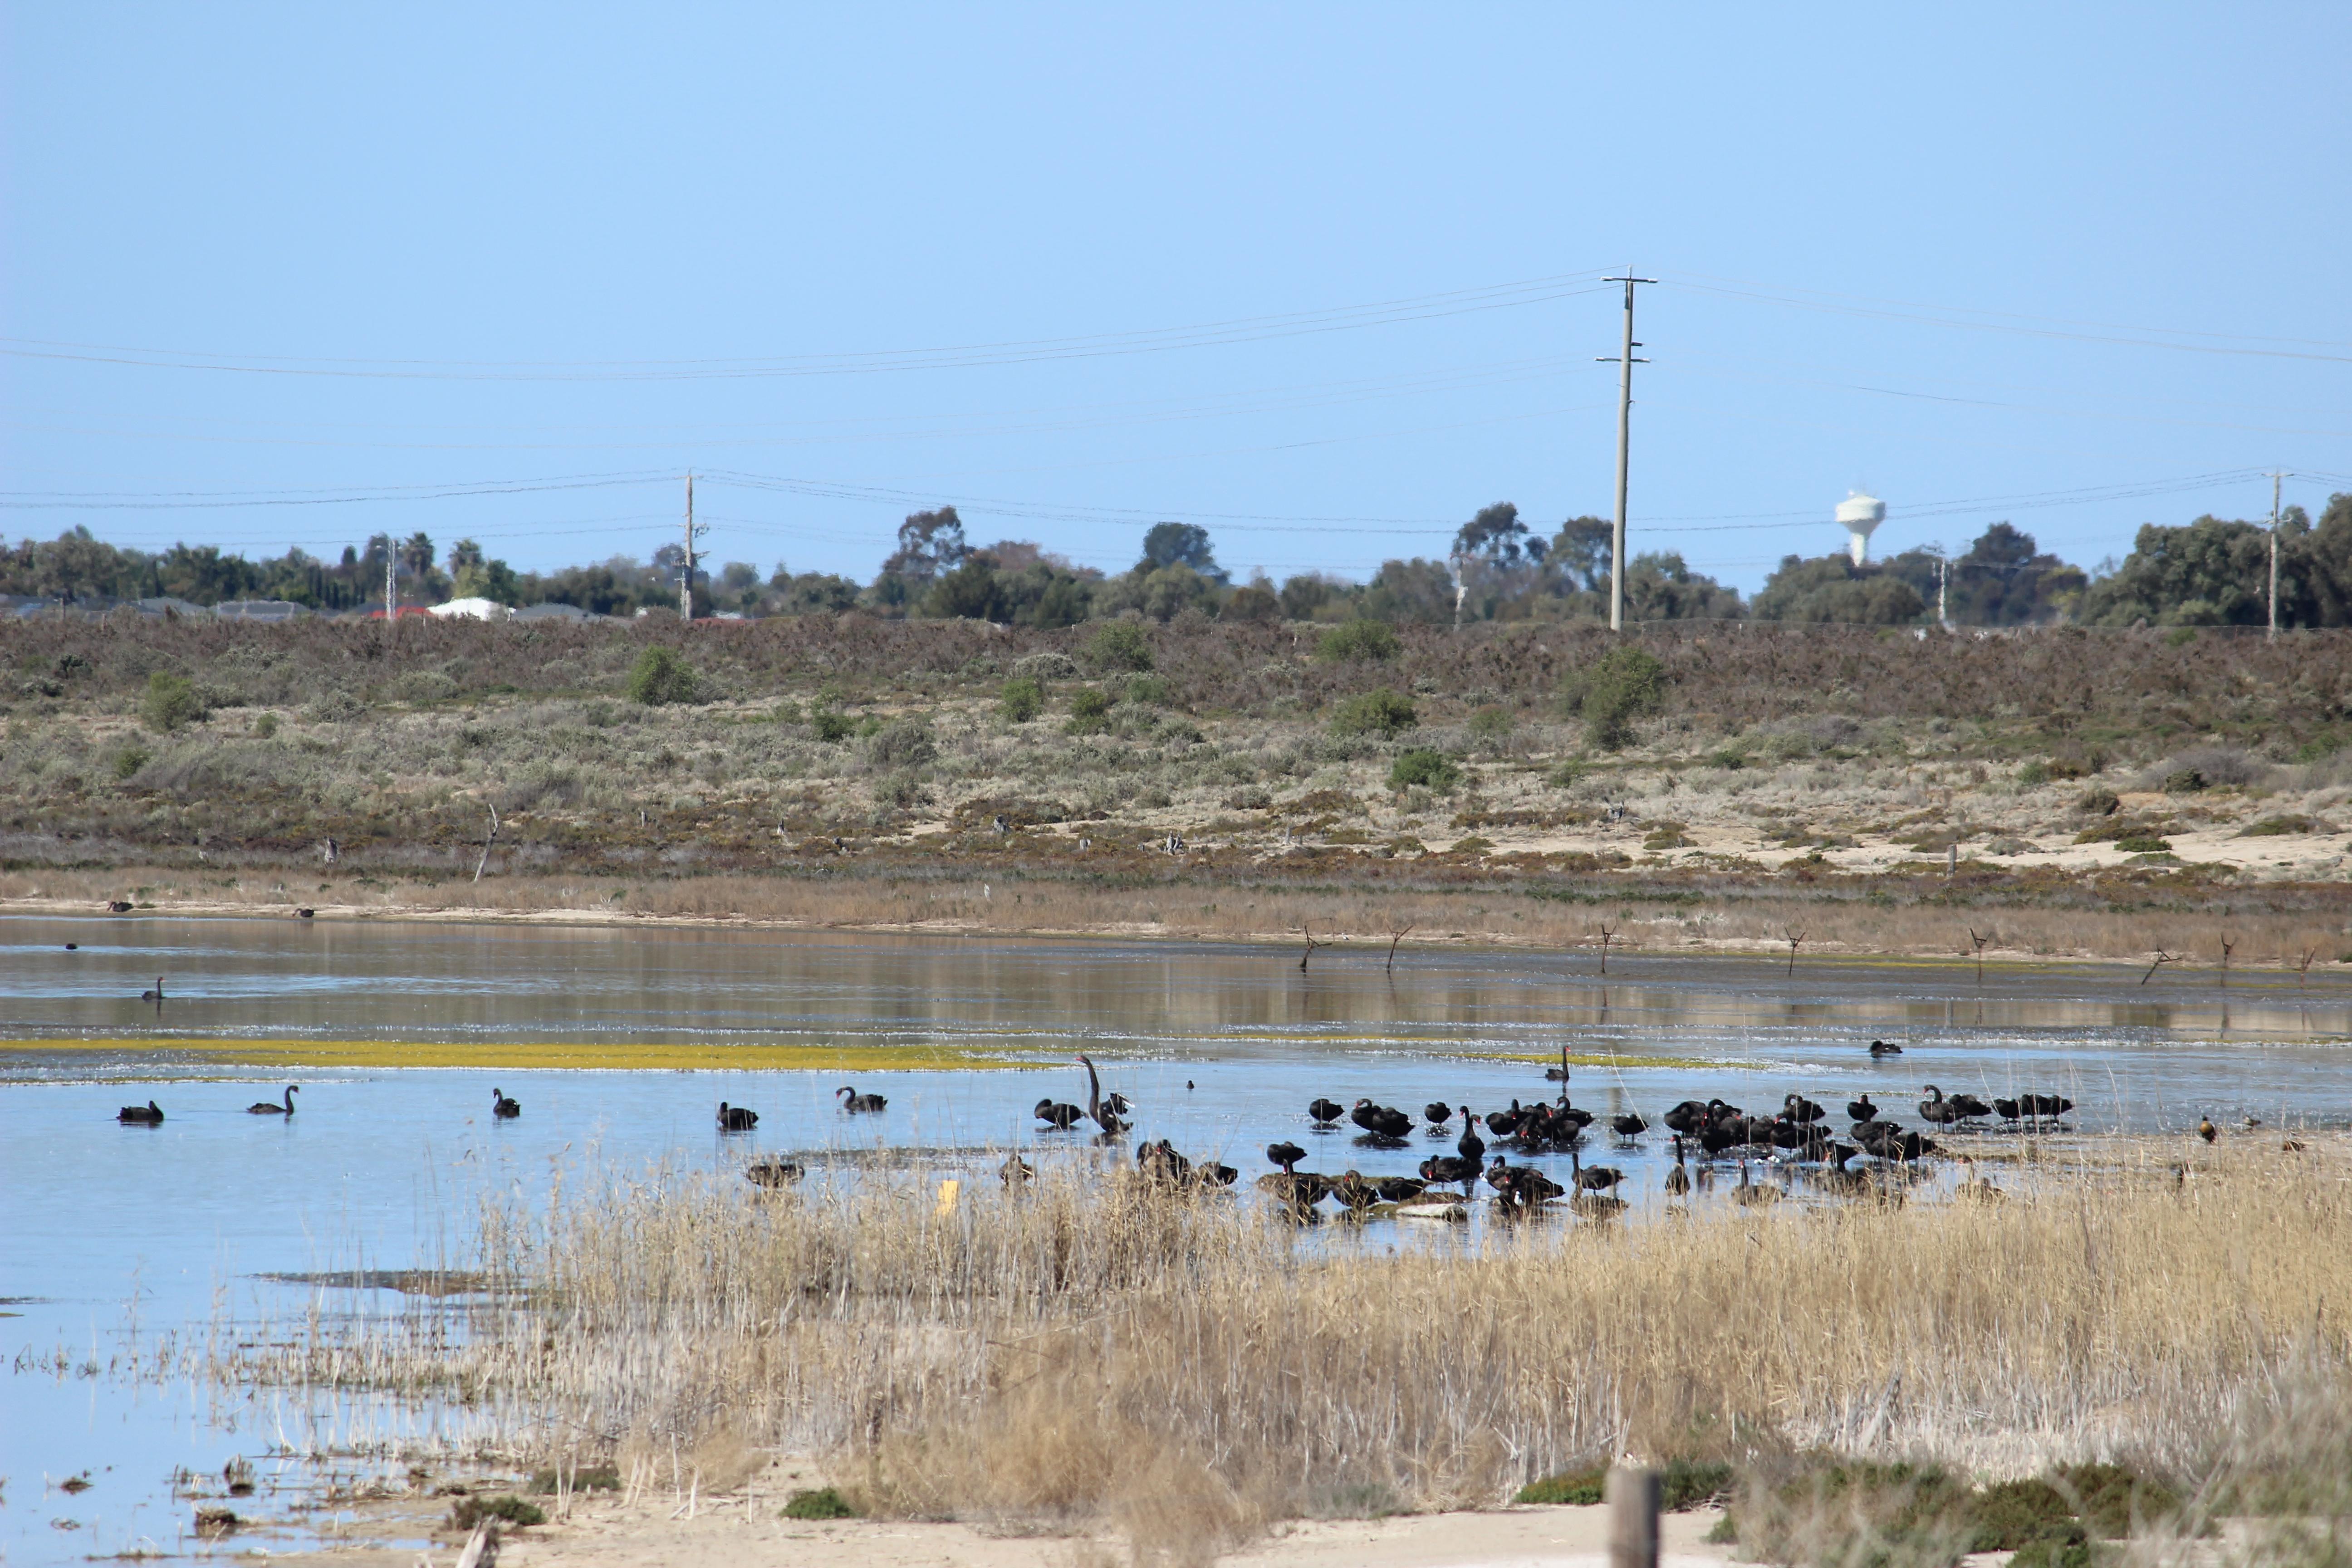 Cabarita swan population